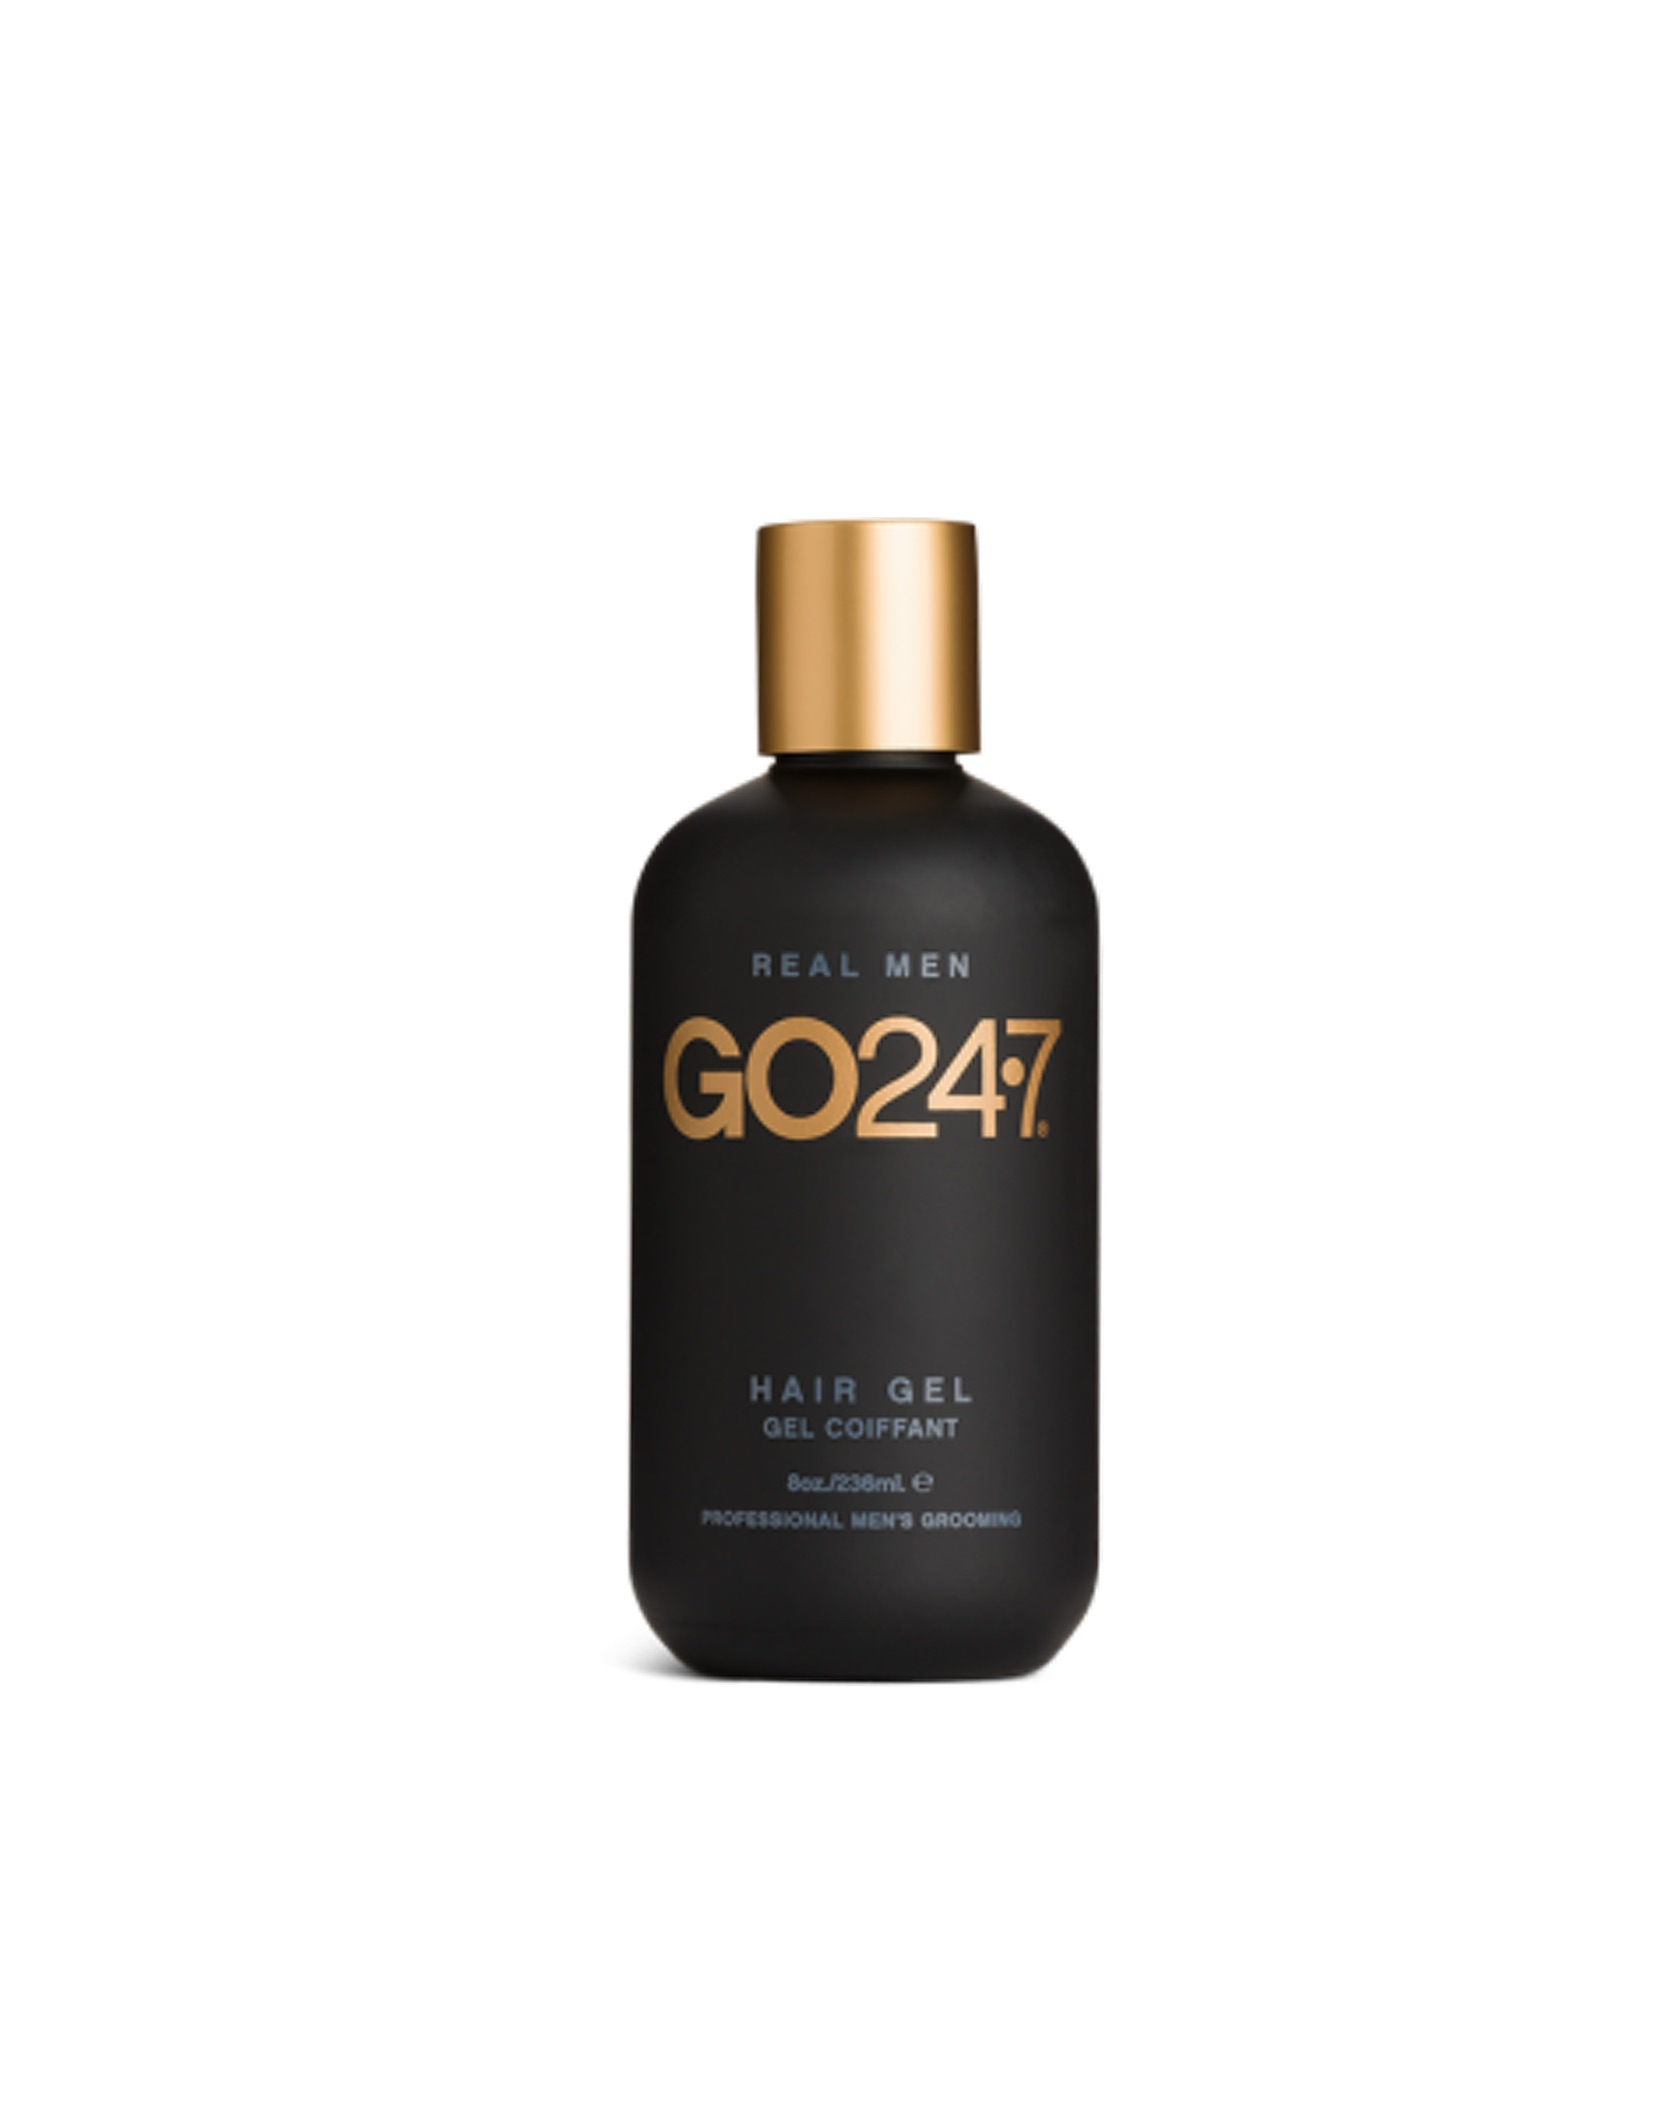 247 Hair gel.jpg